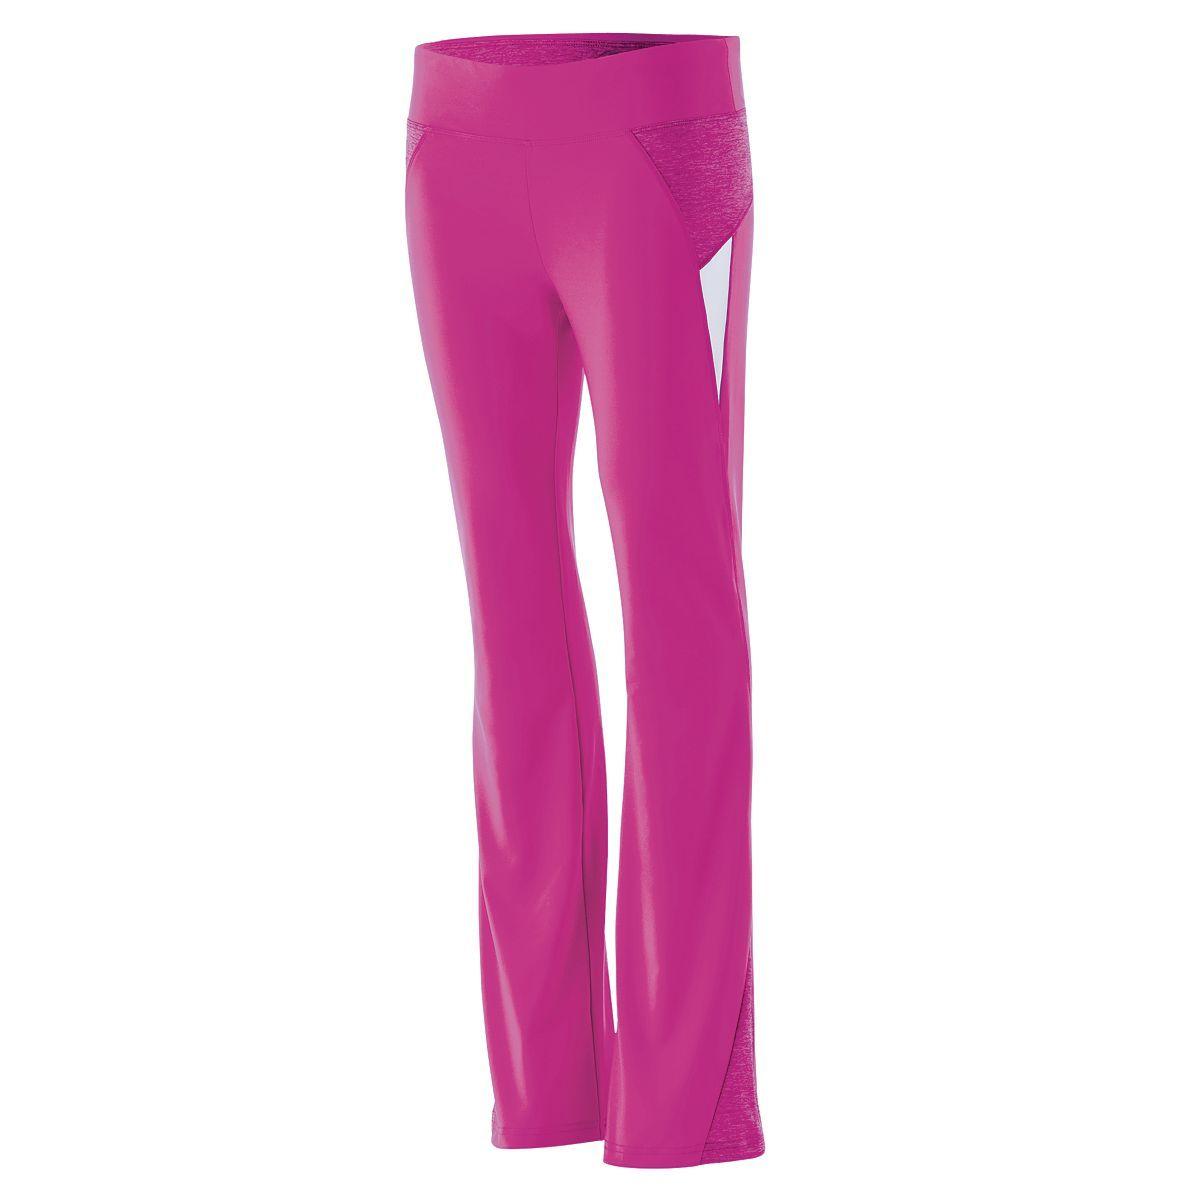 Girls Tumble Pant - POWER PINK/PINK HEATHER/WHITE